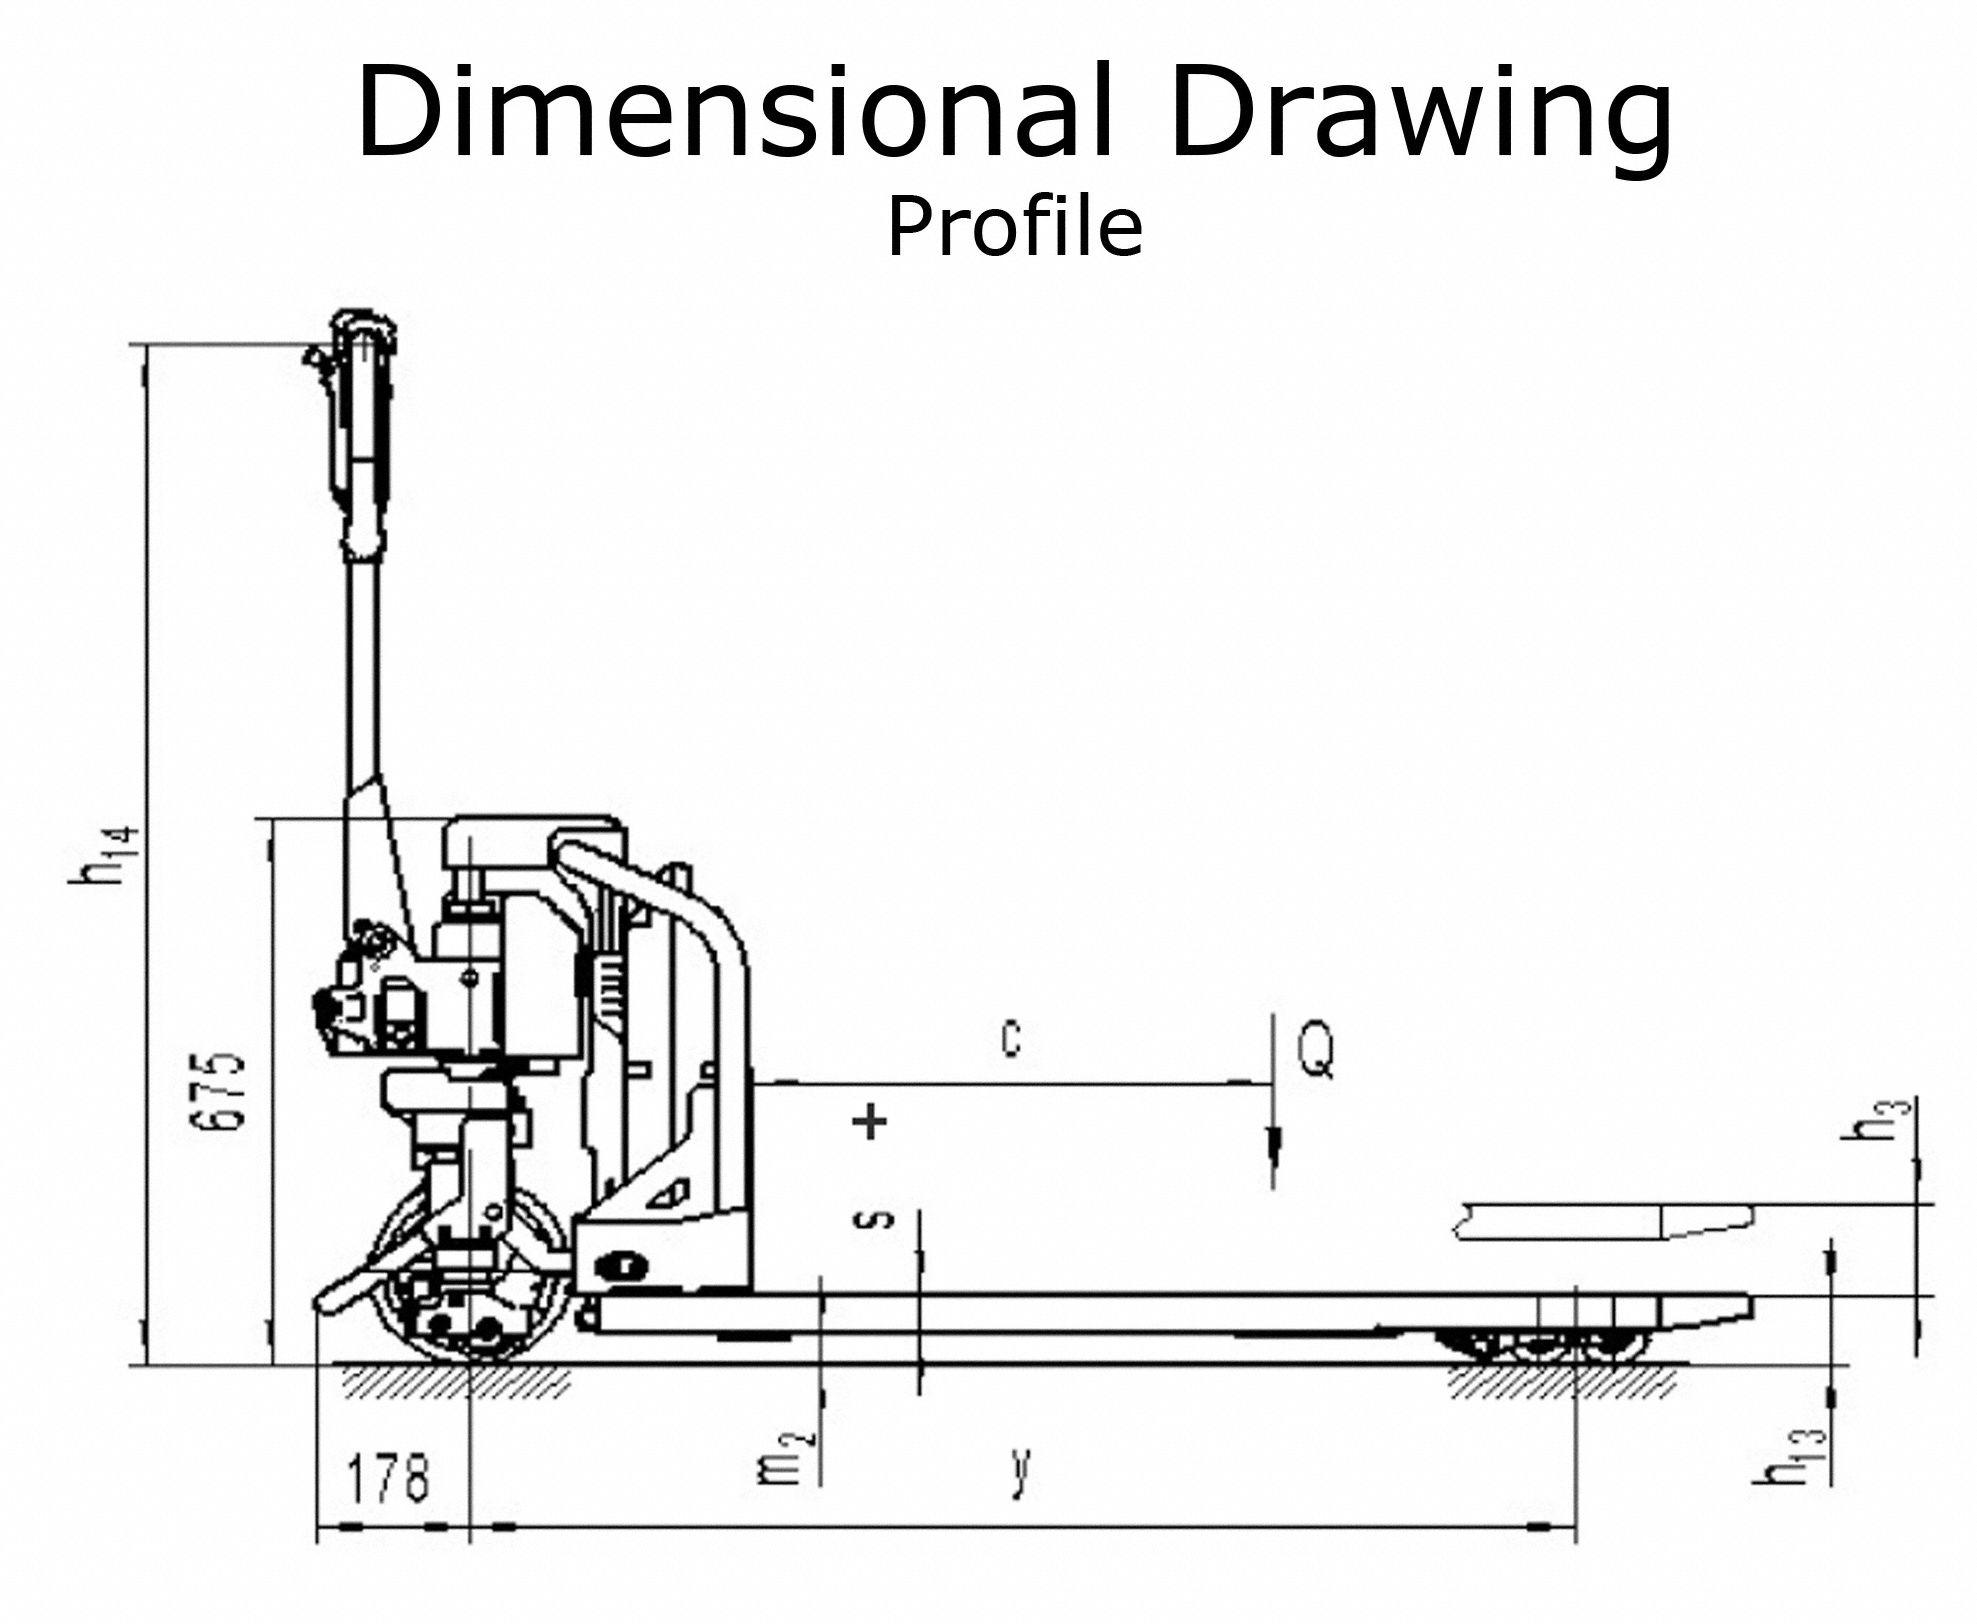 DAYTON Manual-Lift/Powered-Drive Pallet Jack, 3,300 lb